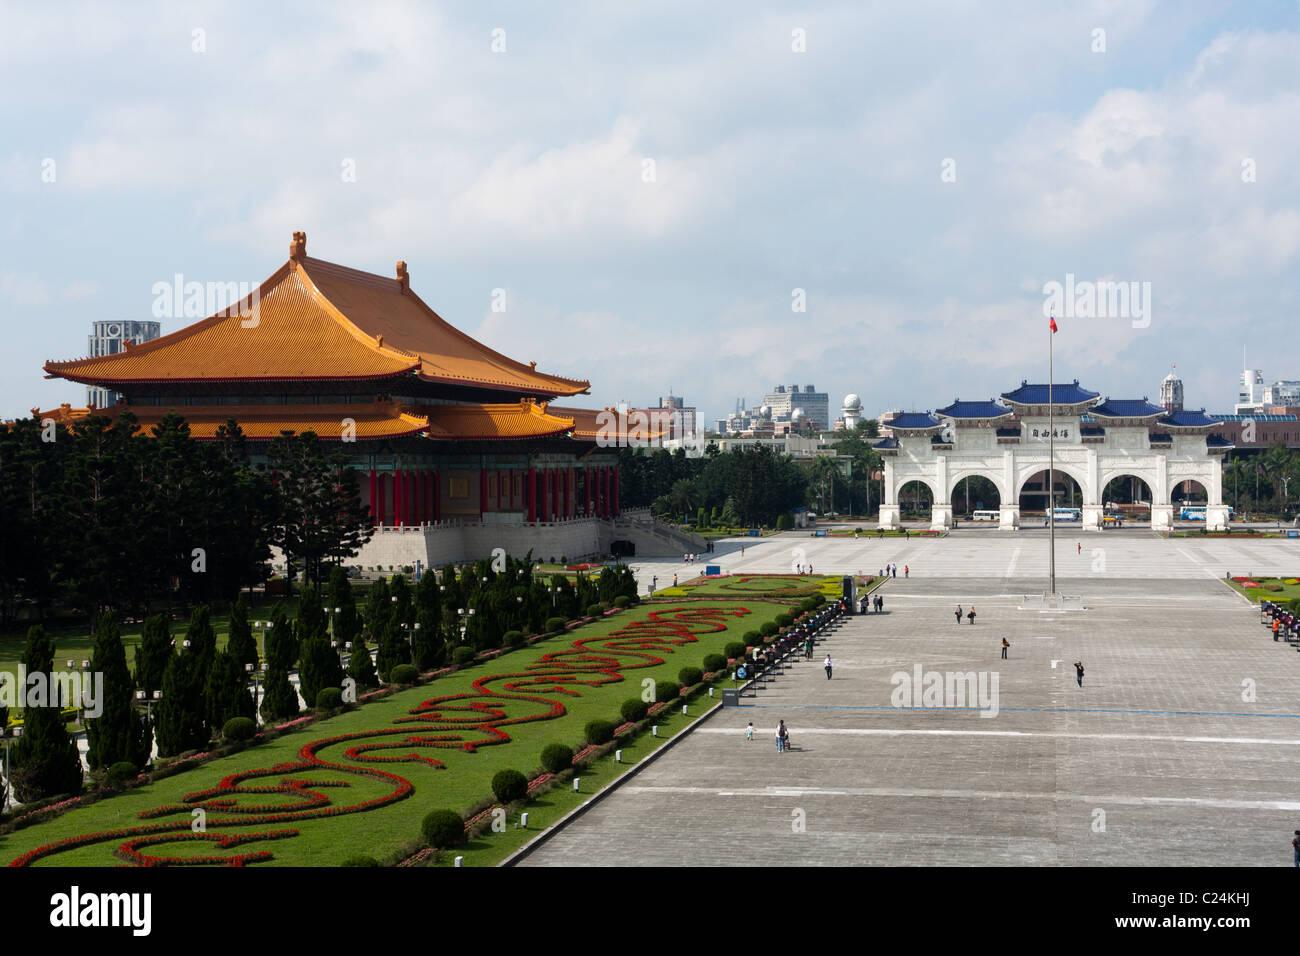 (L-R), el Teatro Nacional y la Plaza de la Libertad (Freedom Square) gran puerta histórica con 5 arcos, Zhongzheng, Imagen De Stock